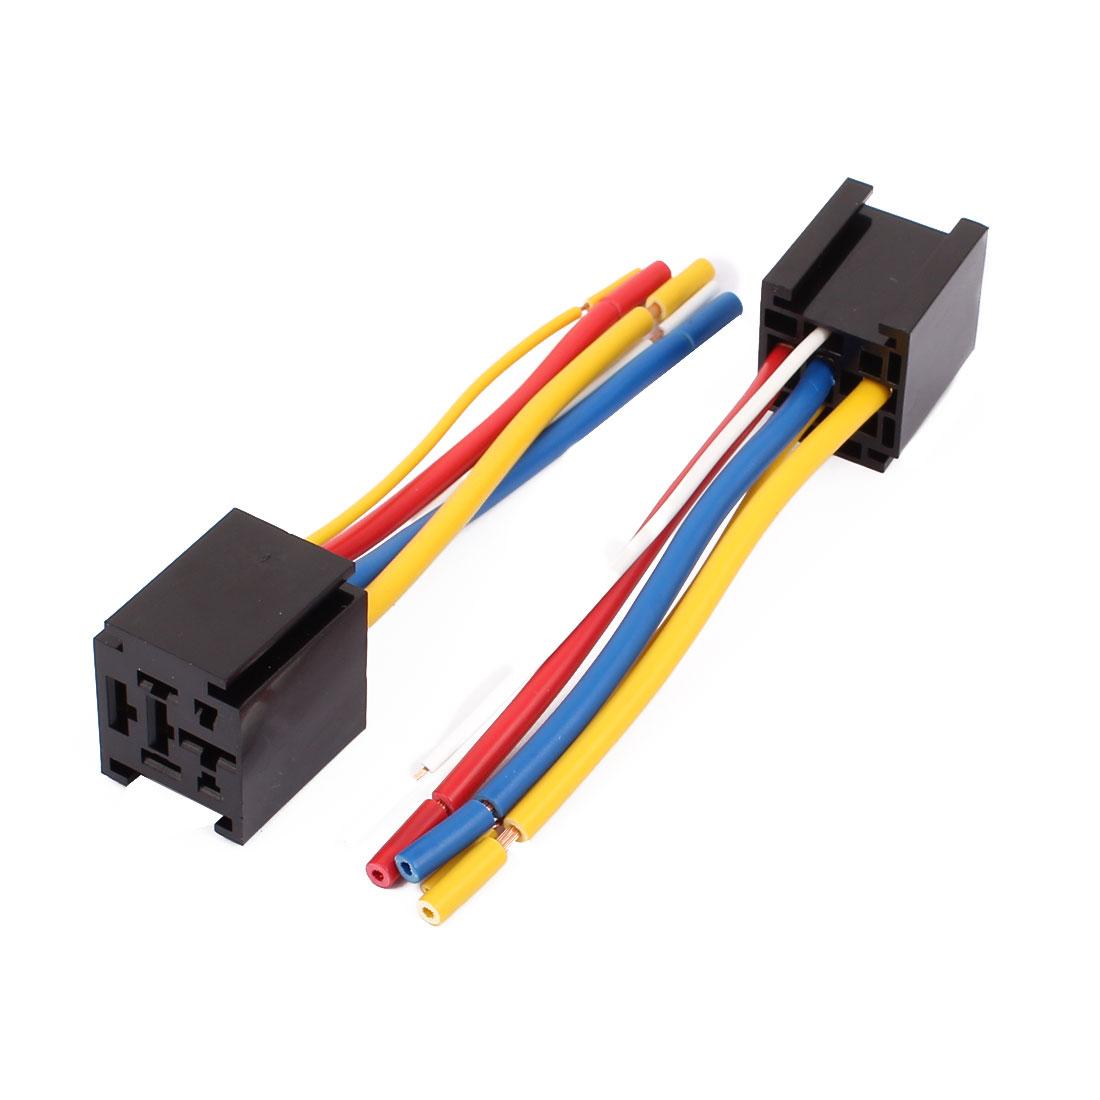 2 Pcs Car Truck DC 12V/24V 80A Relay Socket 5 Pin 5 Wire Socket